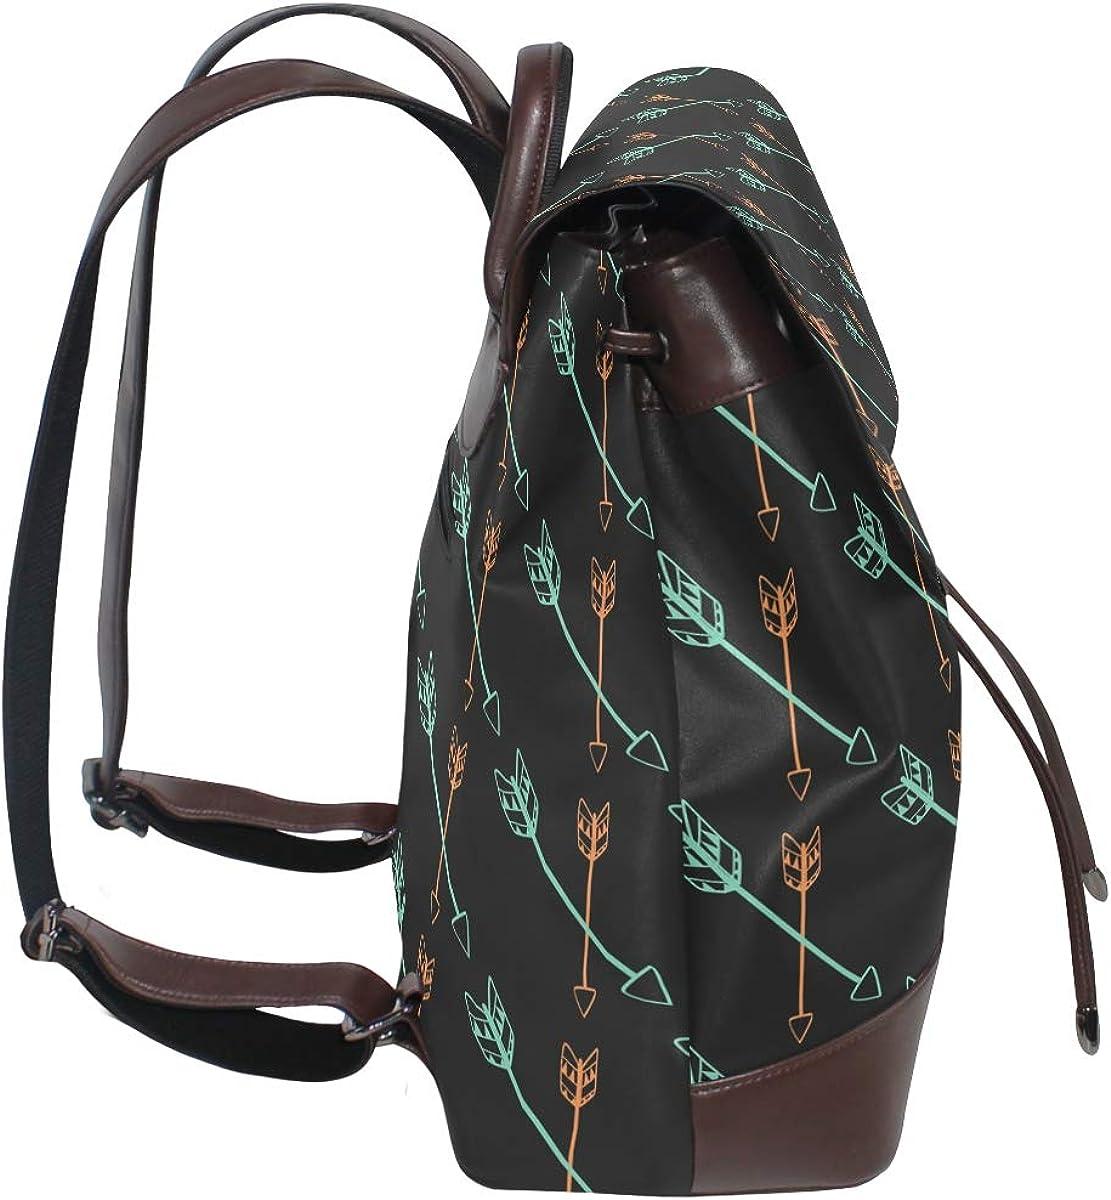 KEAKIA Women PU Leather Feathers Pattern Backpack Purse Travel School Shoulder Bag Casual Daypack